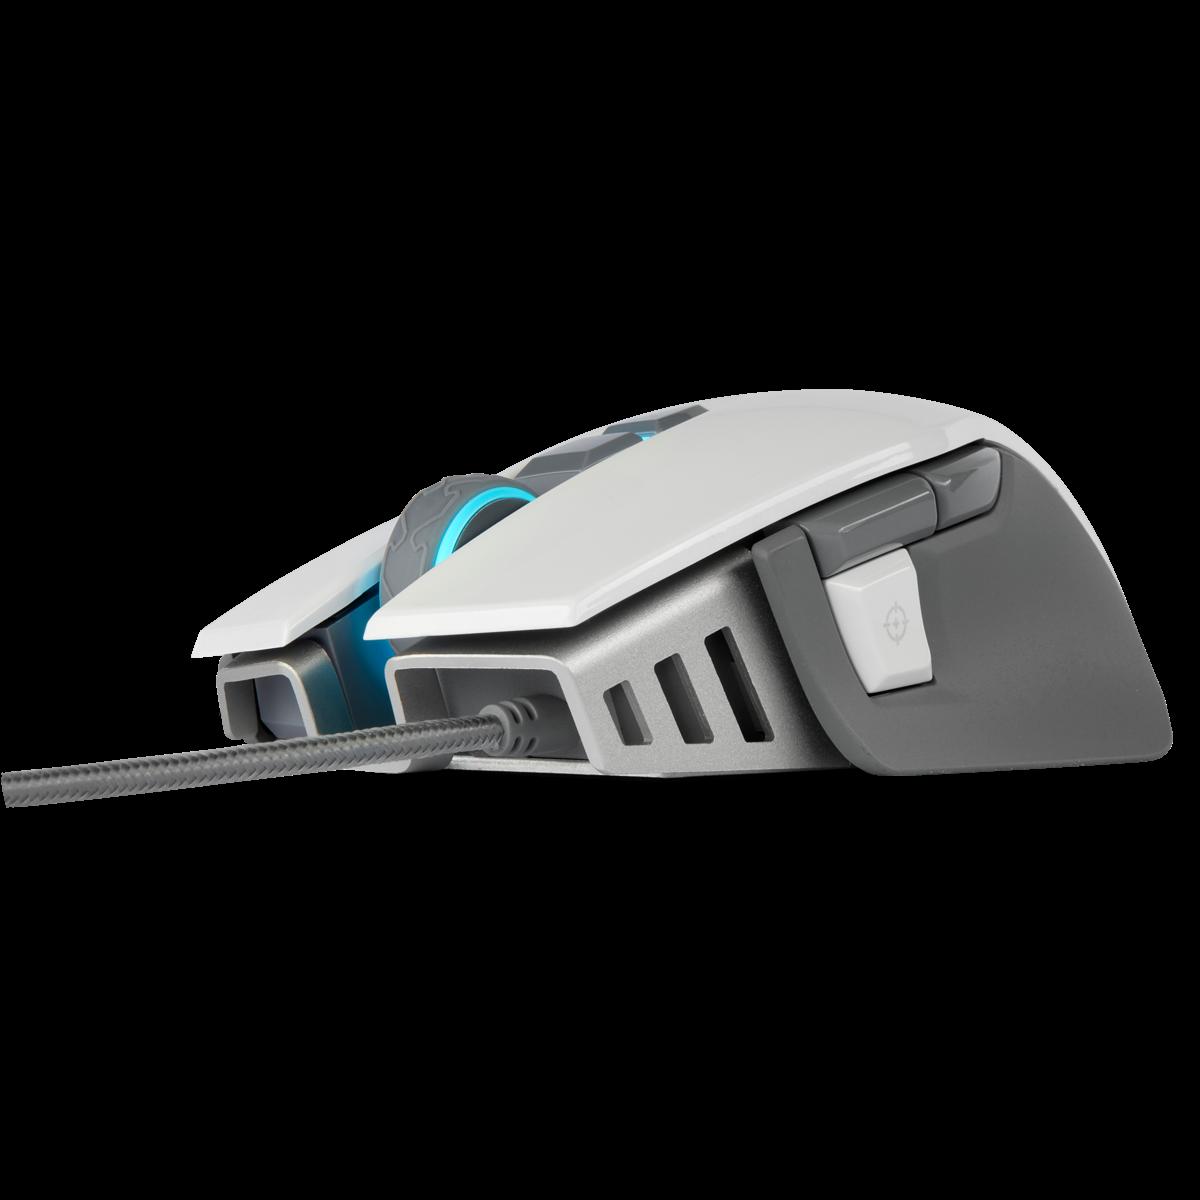 Chuột Corsair M65 RGB Elite - White